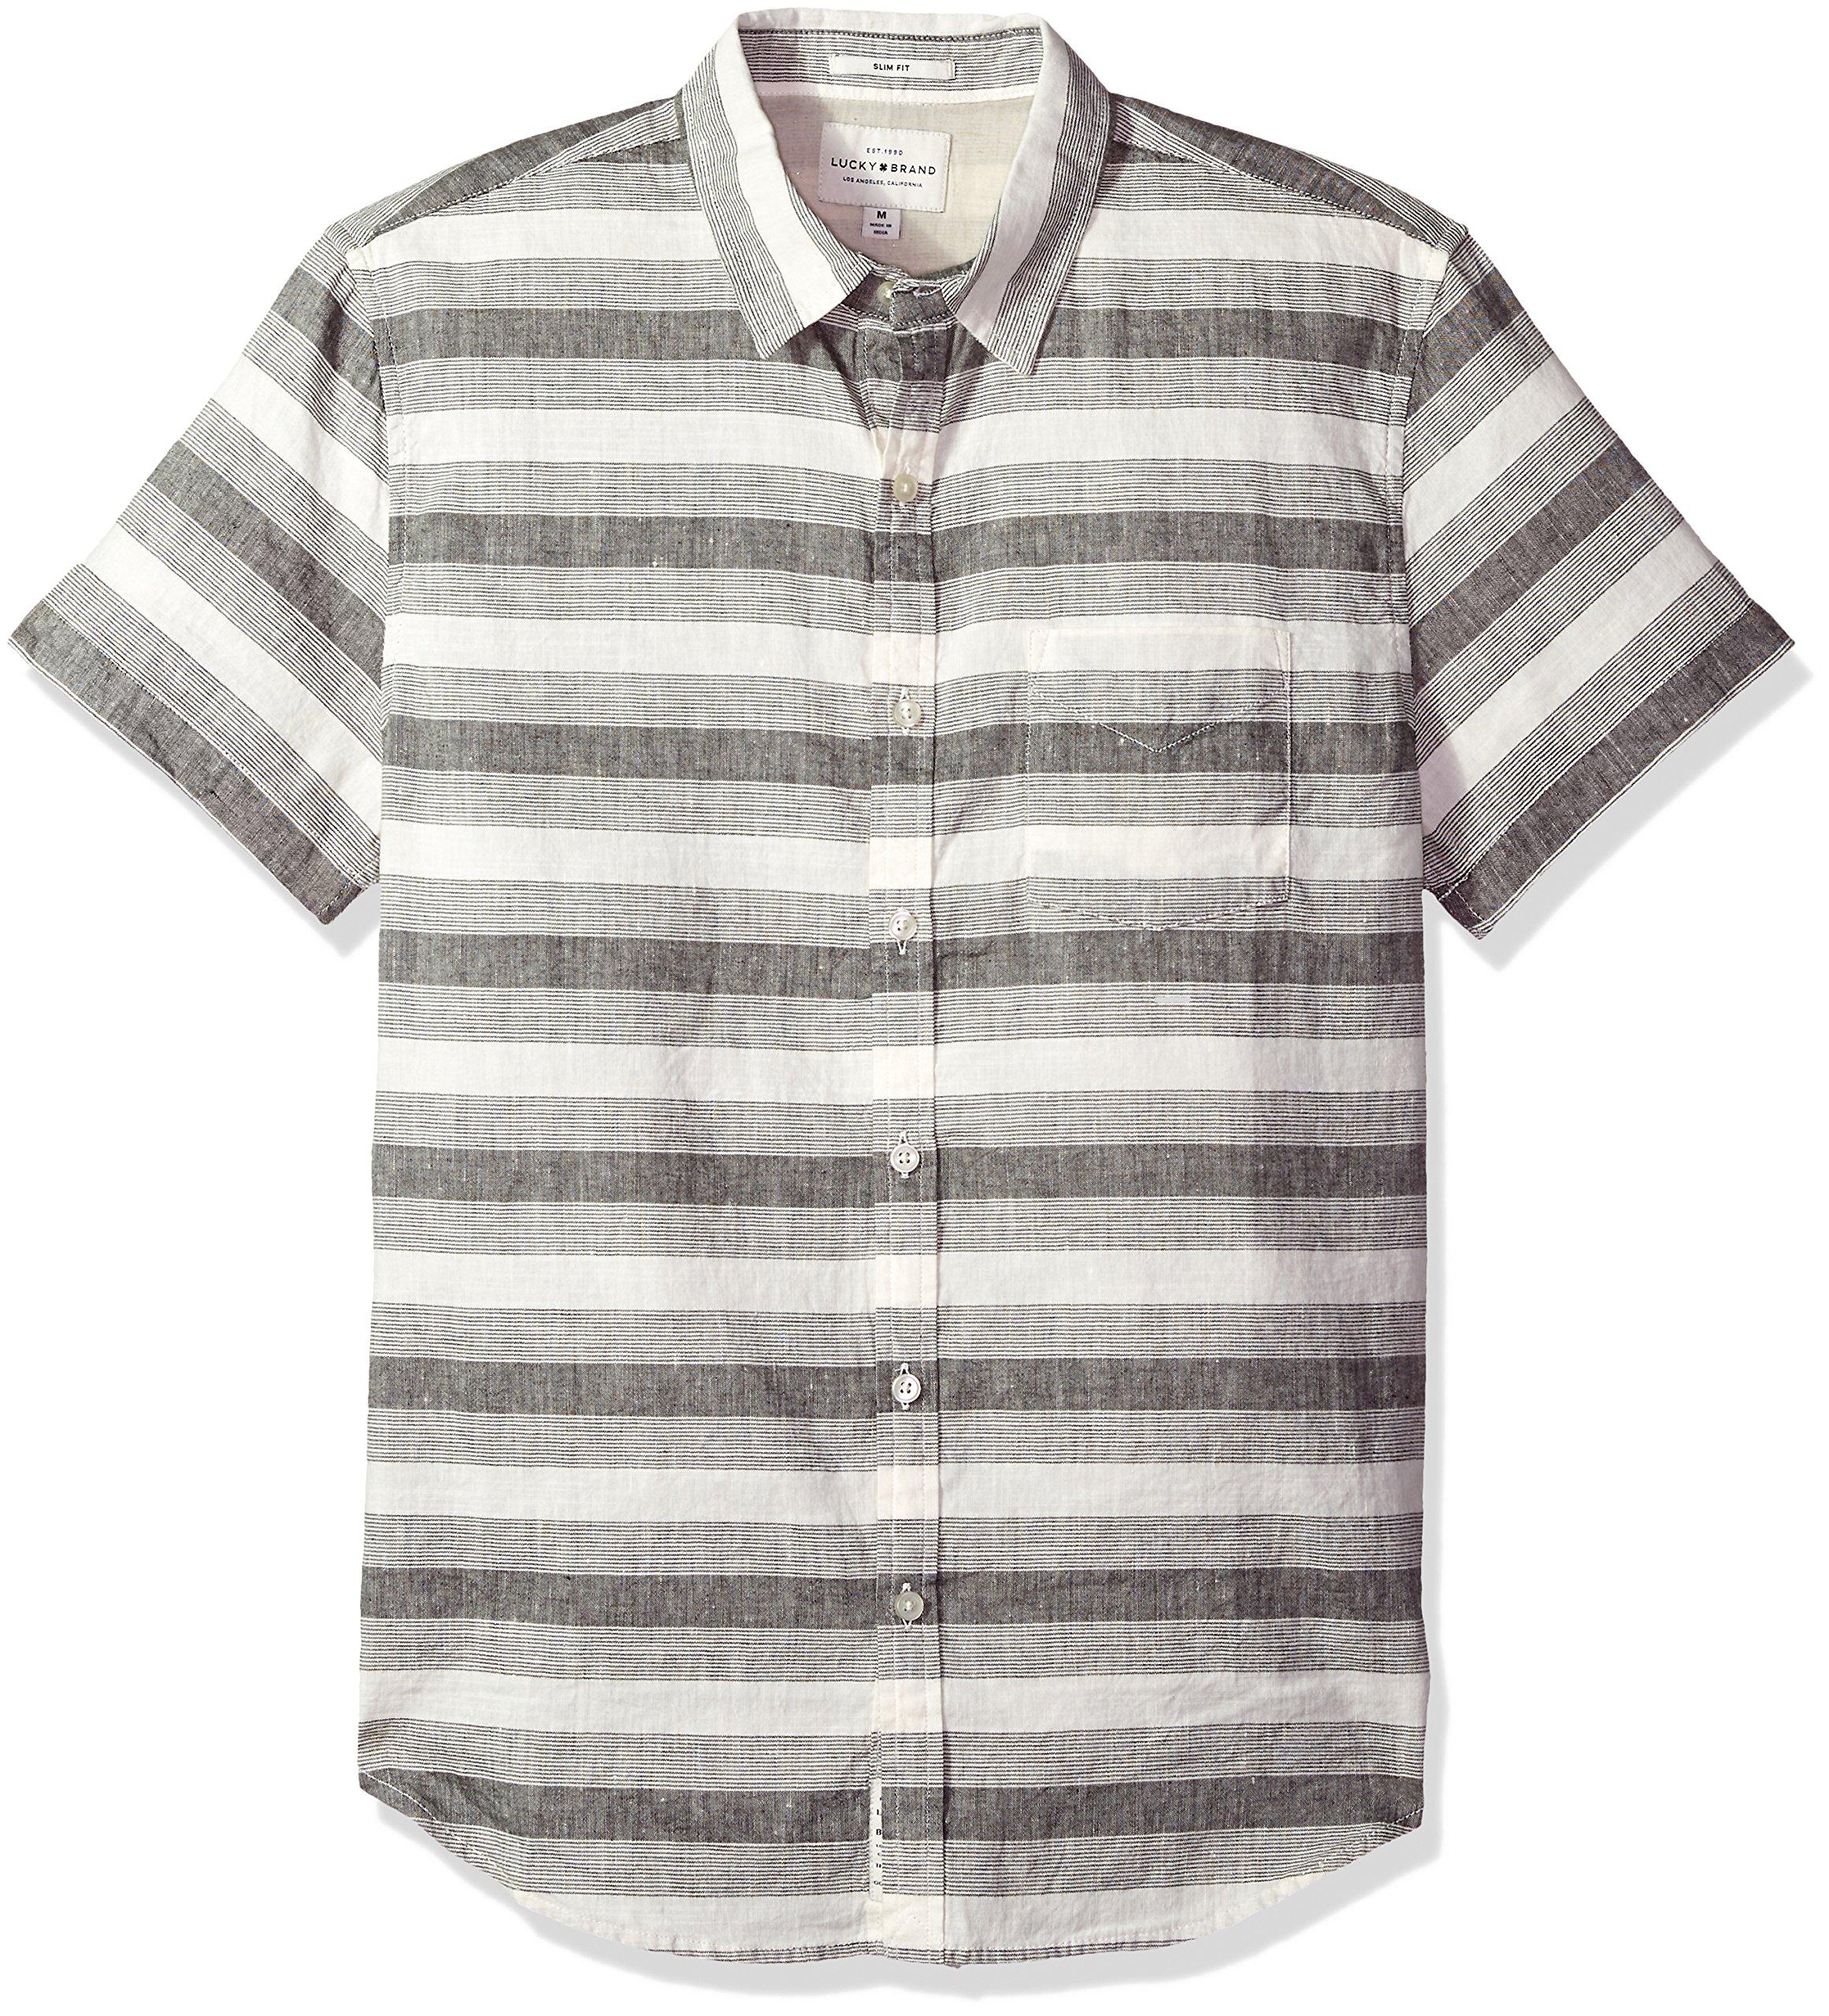 Lucky Brand Men's Casual Short Sleeve Stripe Ballona Button Down Shirt, Grey Stripe, L